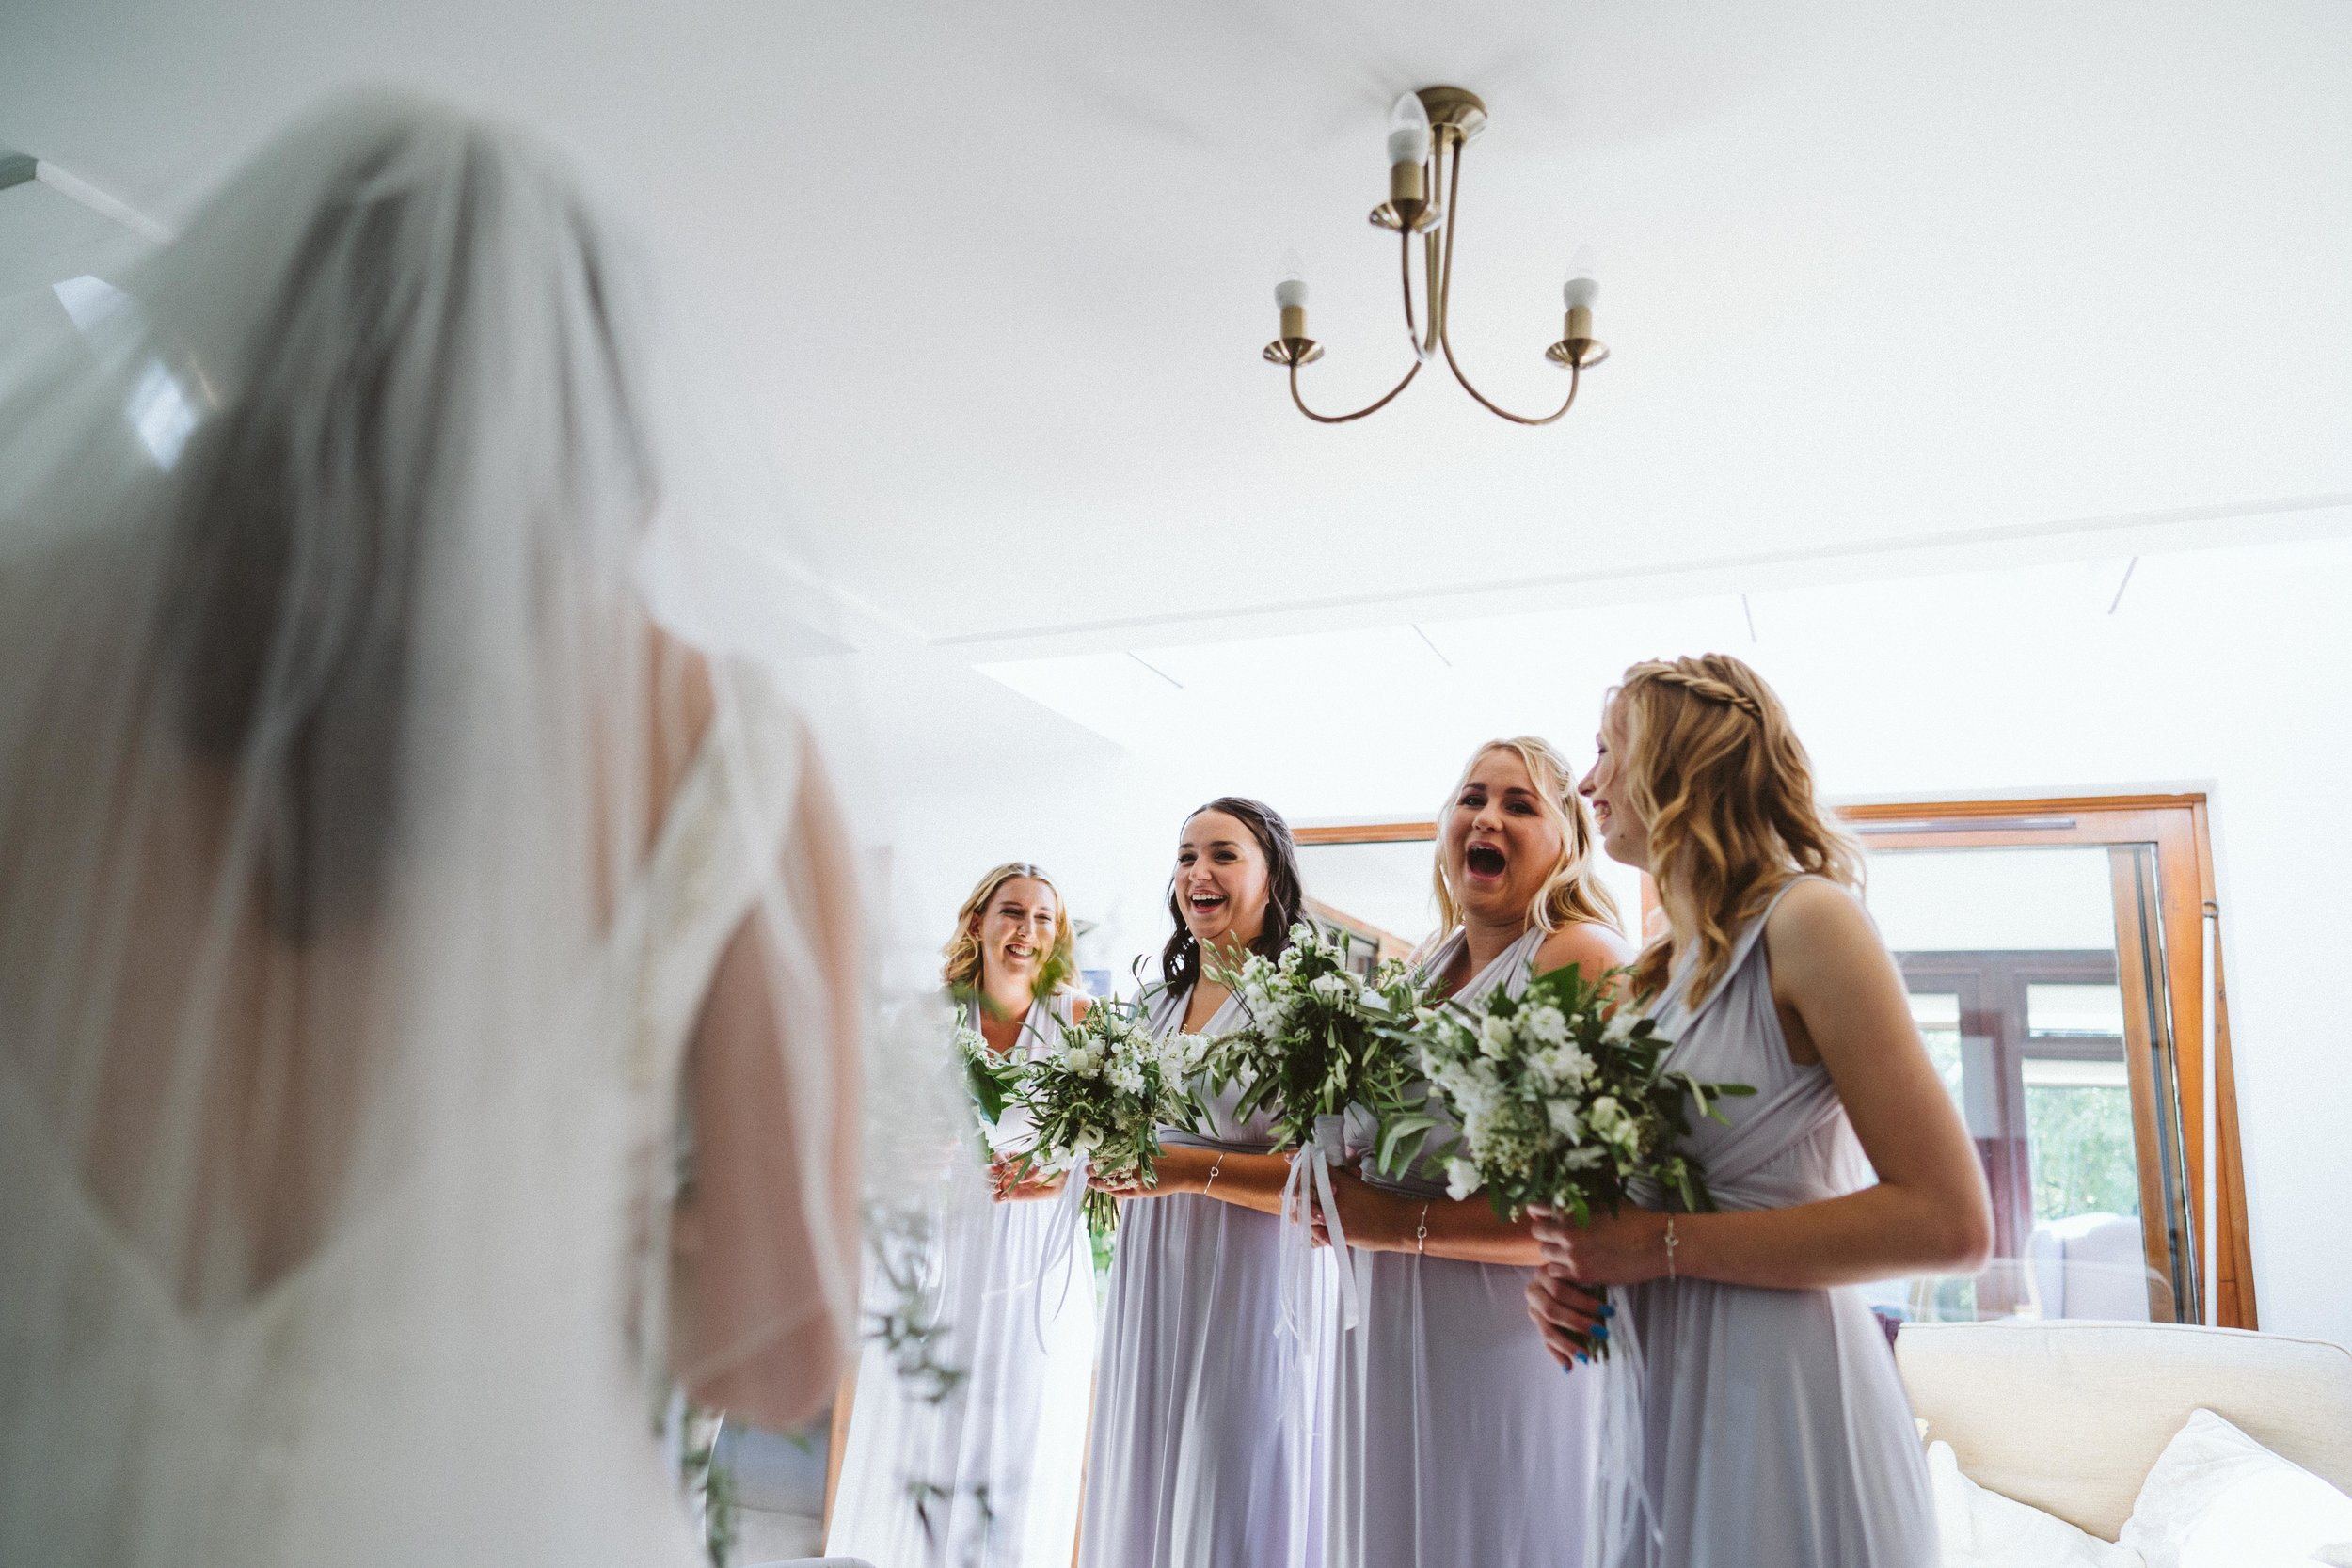 kent-wedding-photographer-107528.jpg